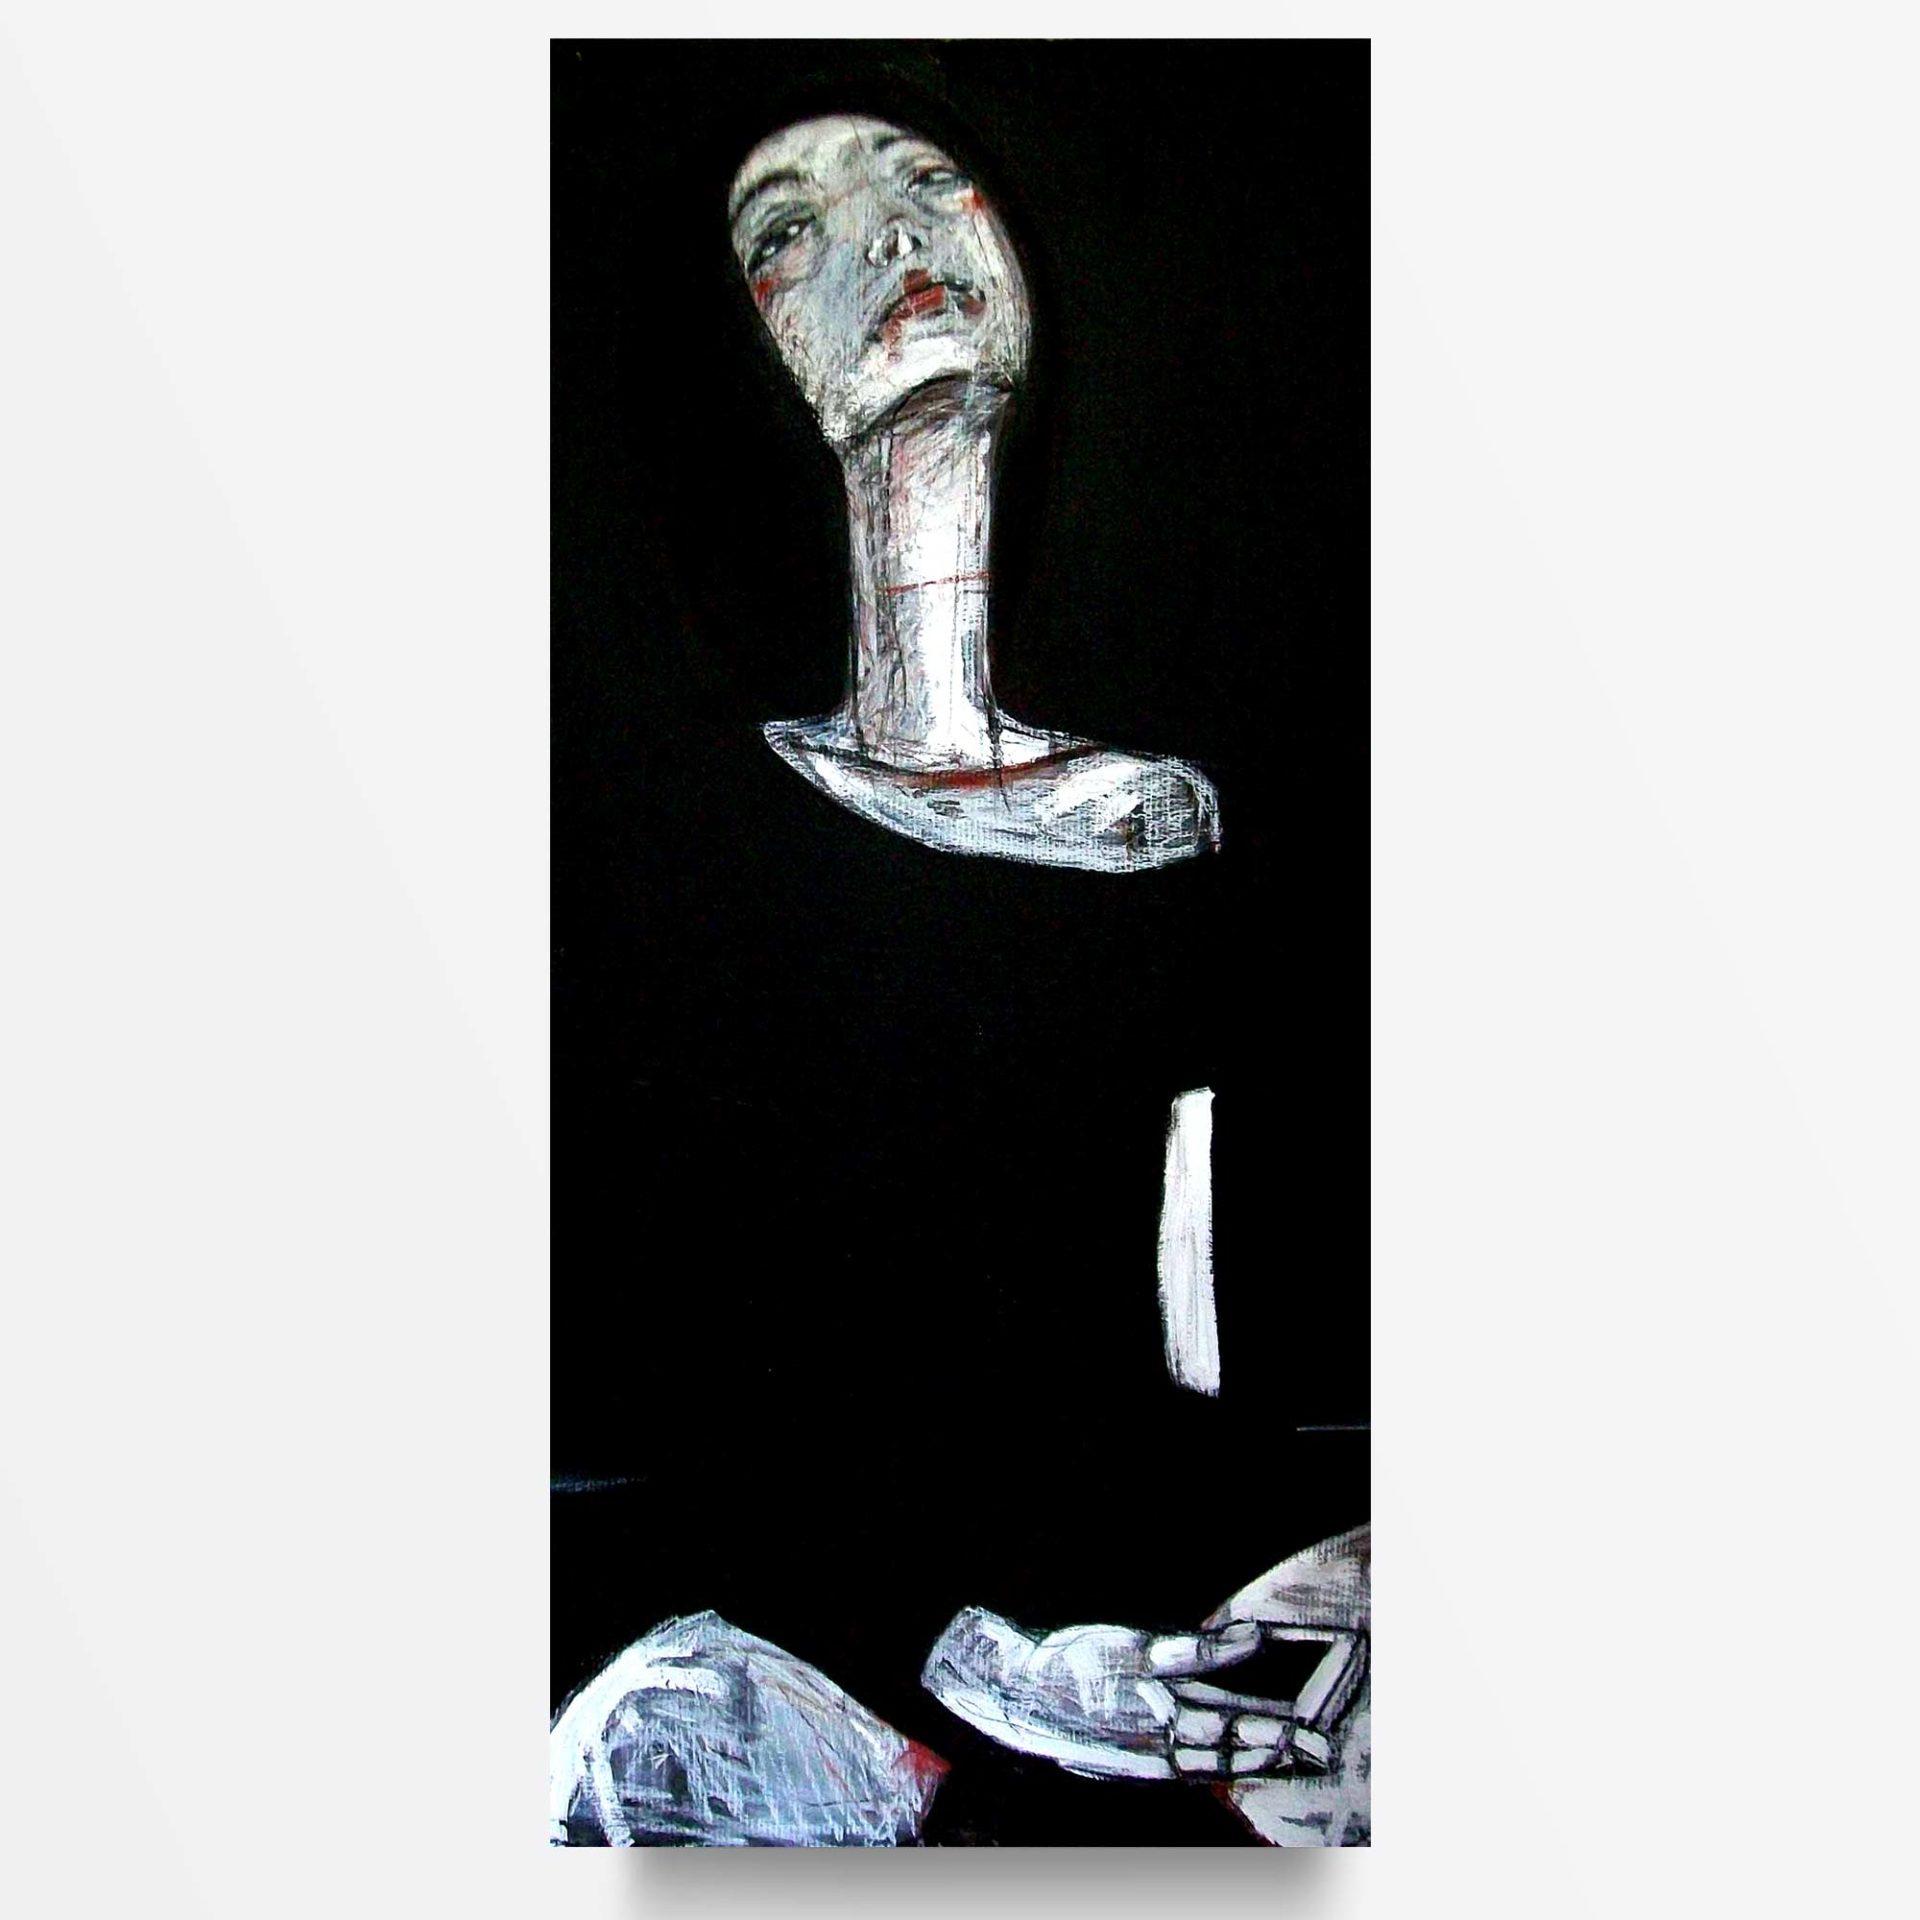 2013 Anni Dieci Prostituta, quadro ad acrilico di Diego Gabriele